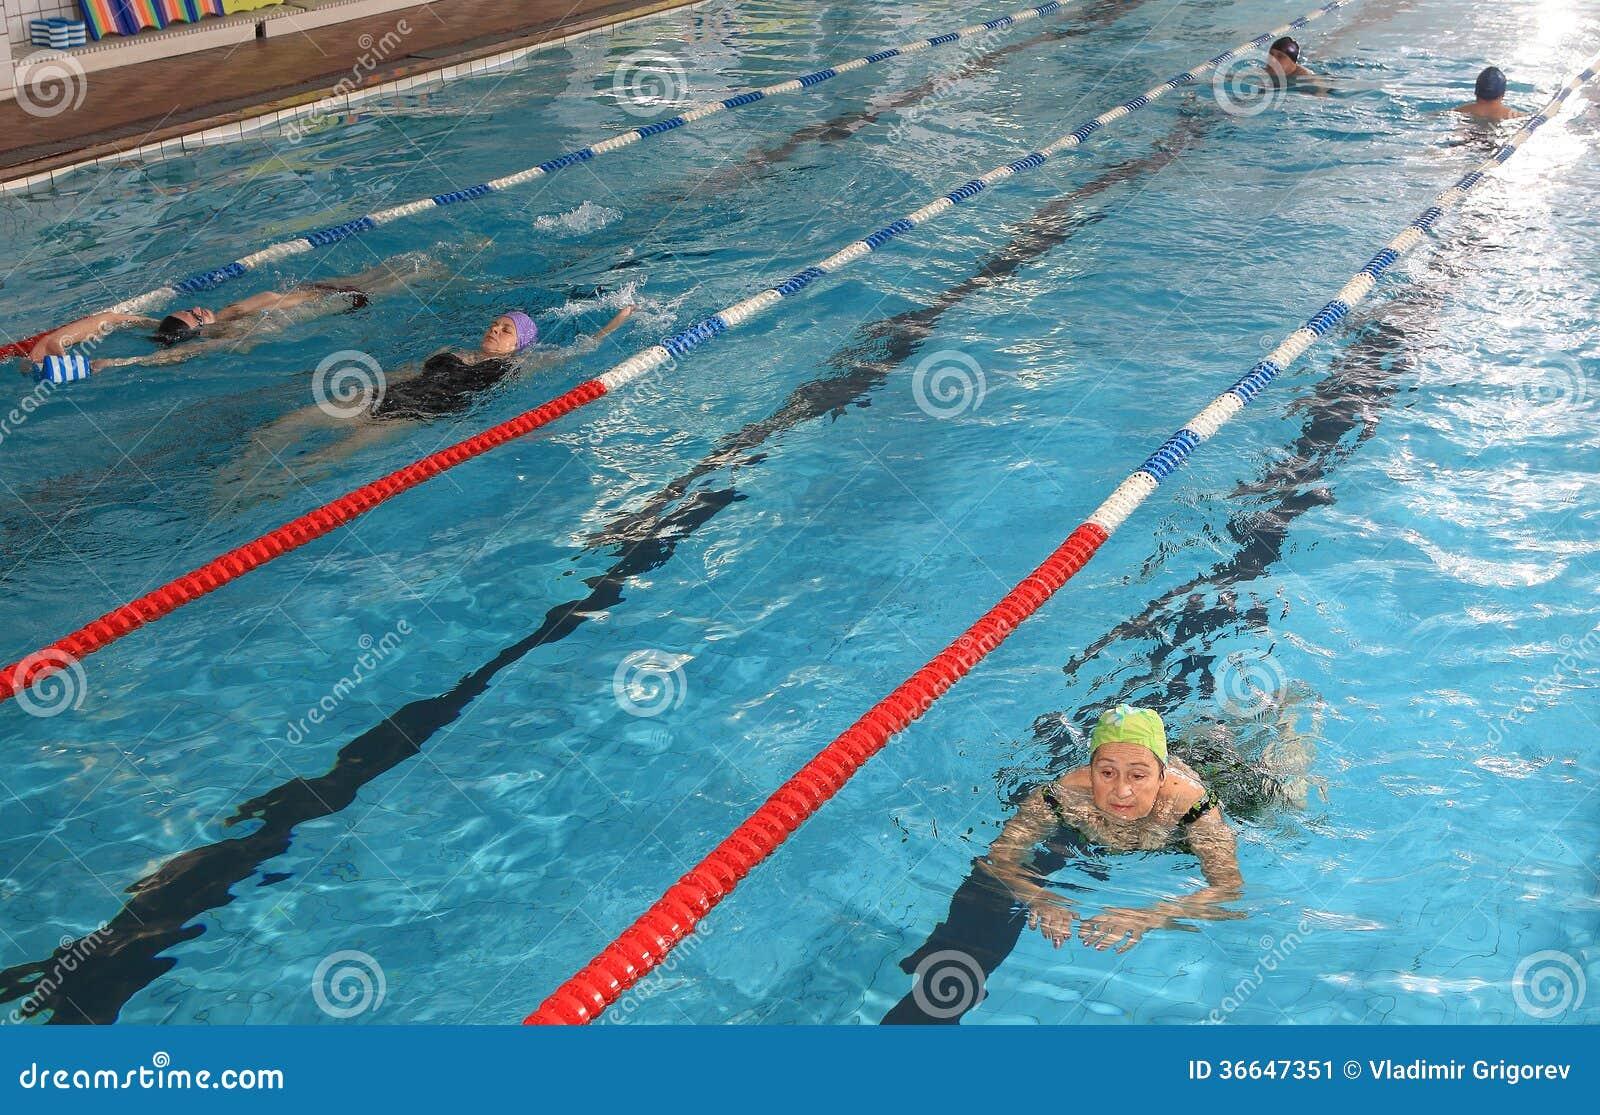 People swimming in public pool editorial image 44313620 for Alderwood pool public swim times